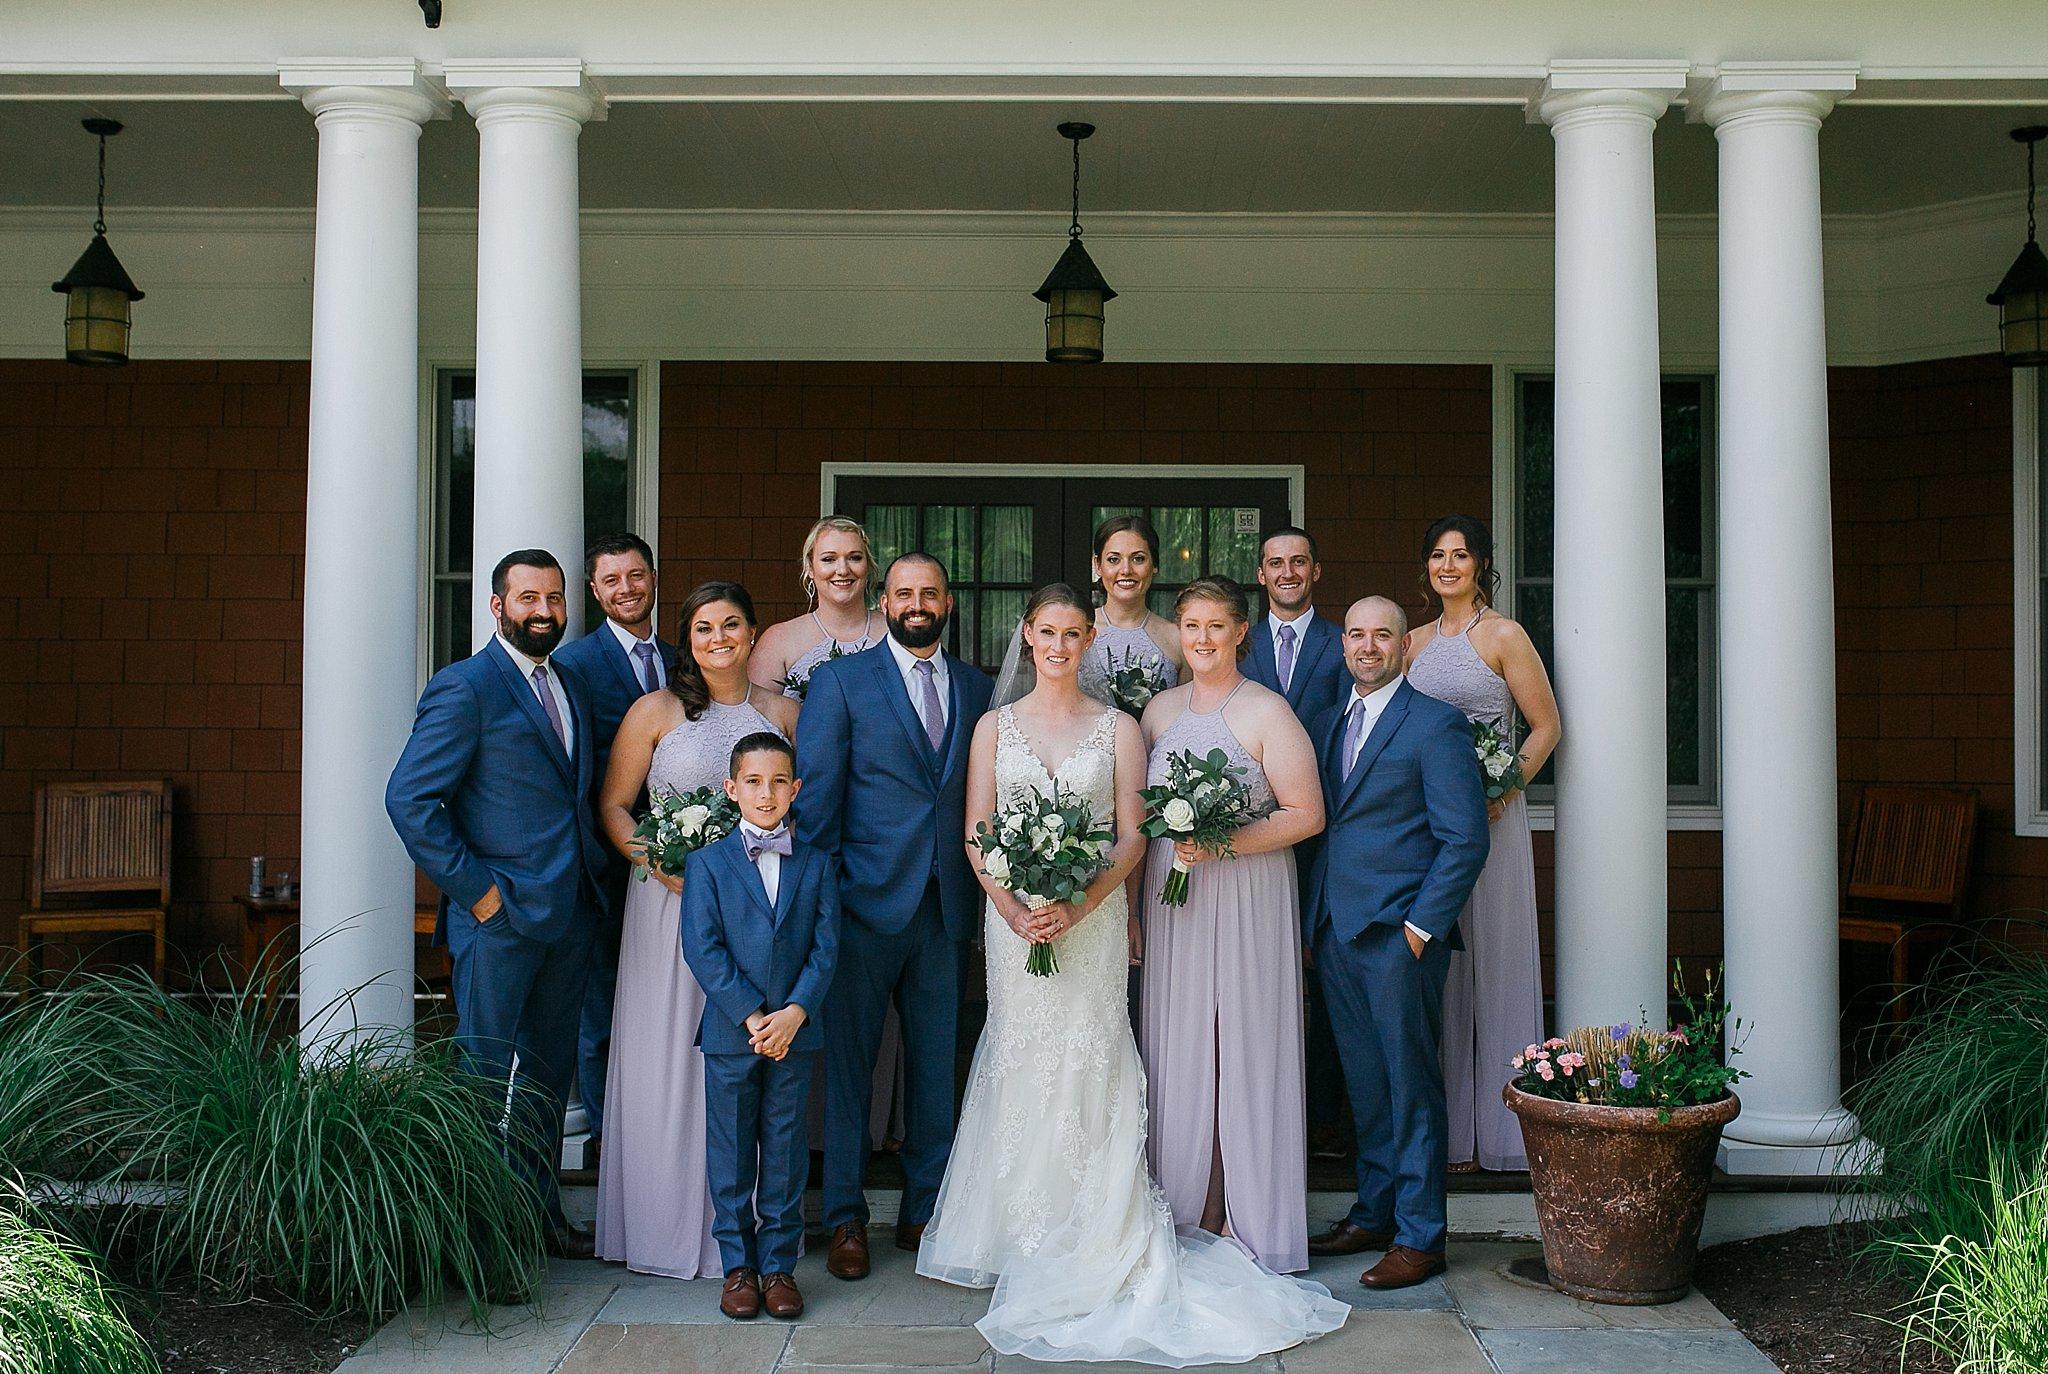 Hollow Brook Golf Club Cortlandt Manor NY Wedding Sweet Alice Photography June Wedding35.jpg